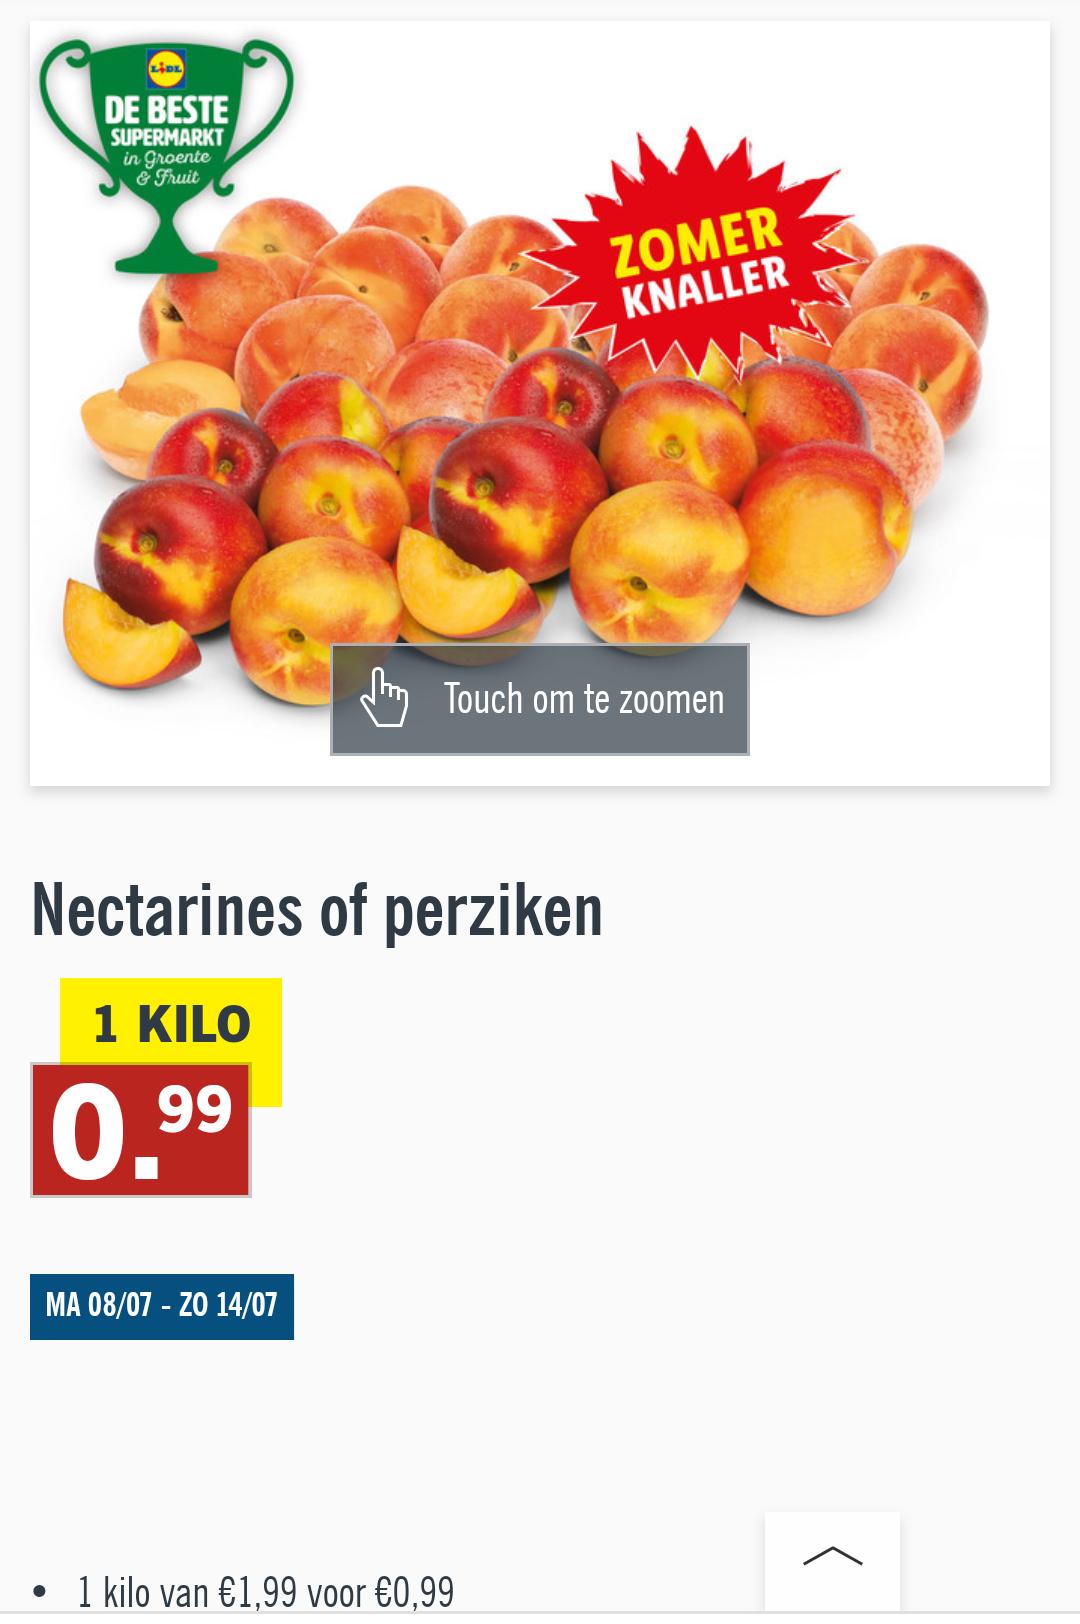 Nectarines of perziken 0.99 per kg @lidl